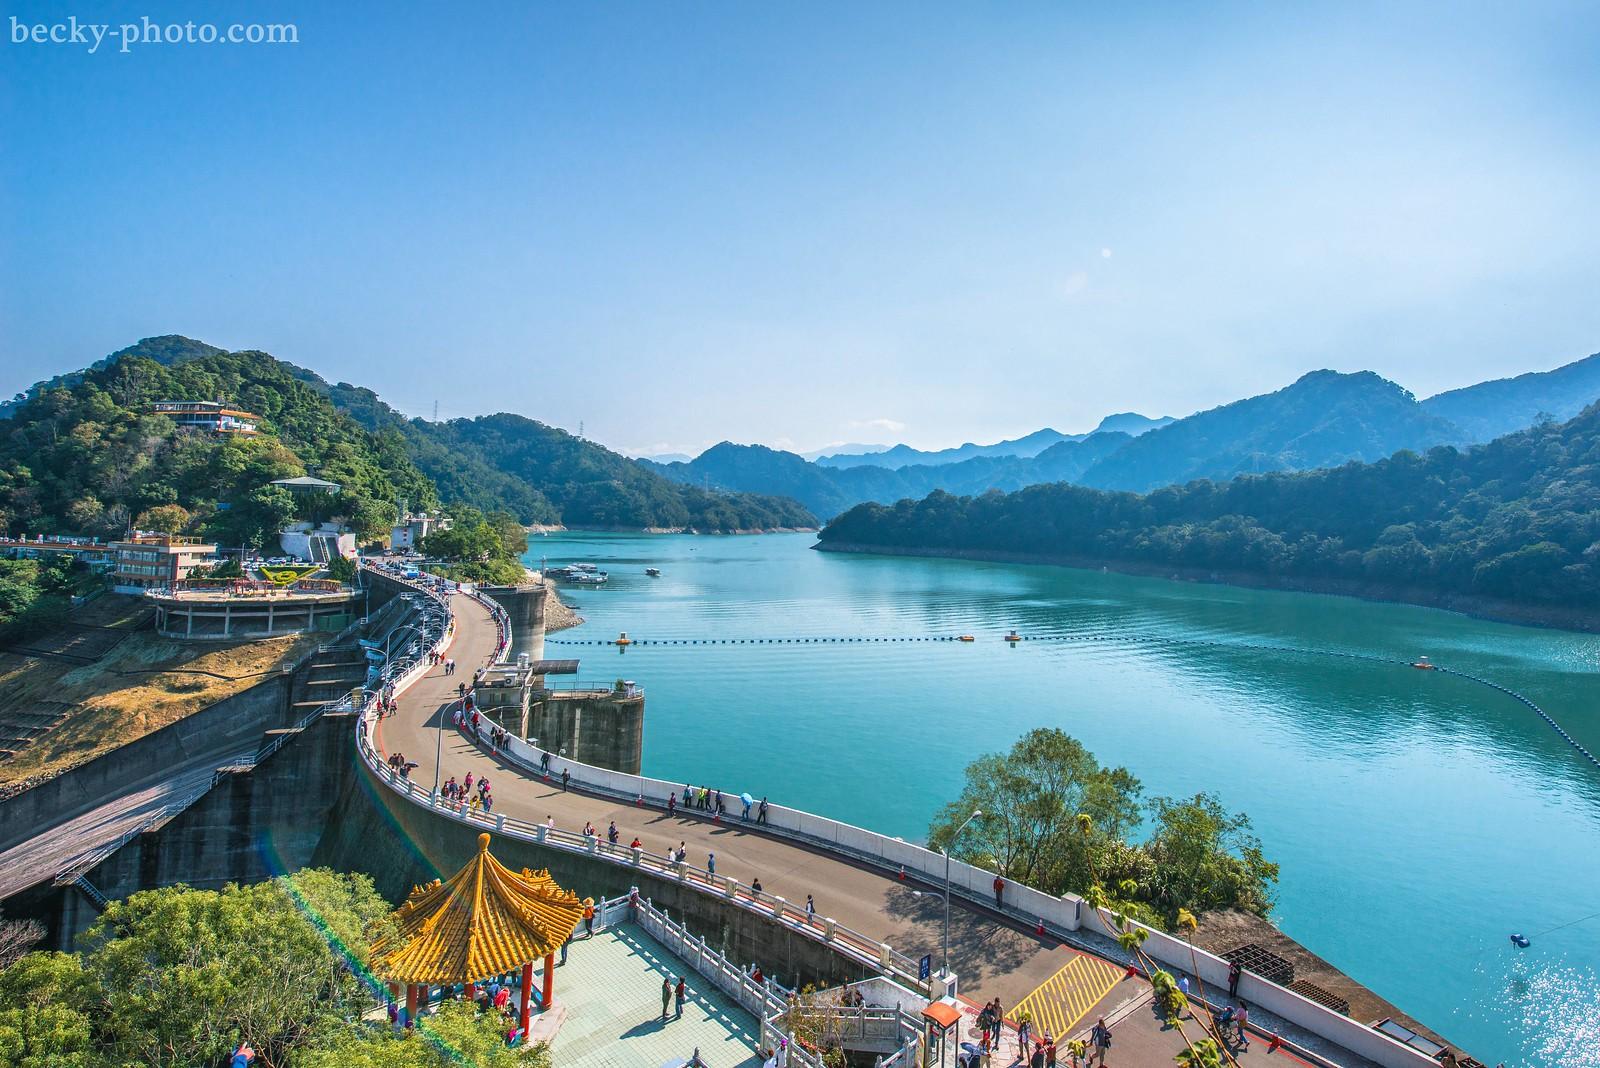 2014.Dec Shihmen Dam 石門水庫